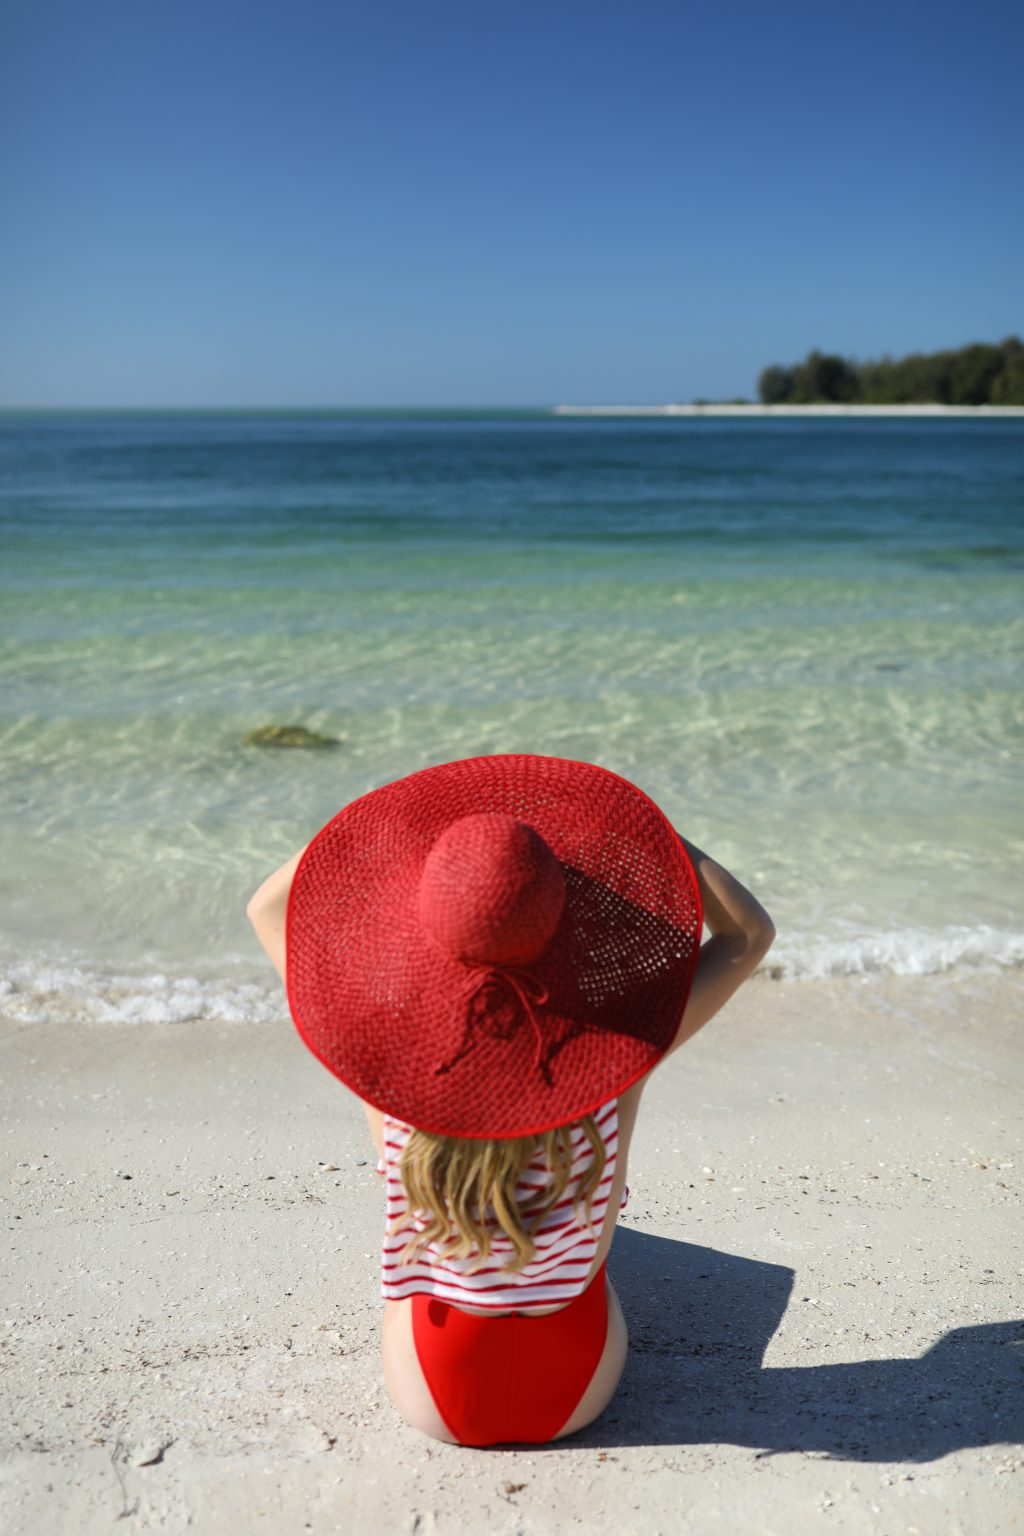 blair-eadie-atlantic-pacific-beach-blog-stripes-asos-red-hat-straw-winter-christmas